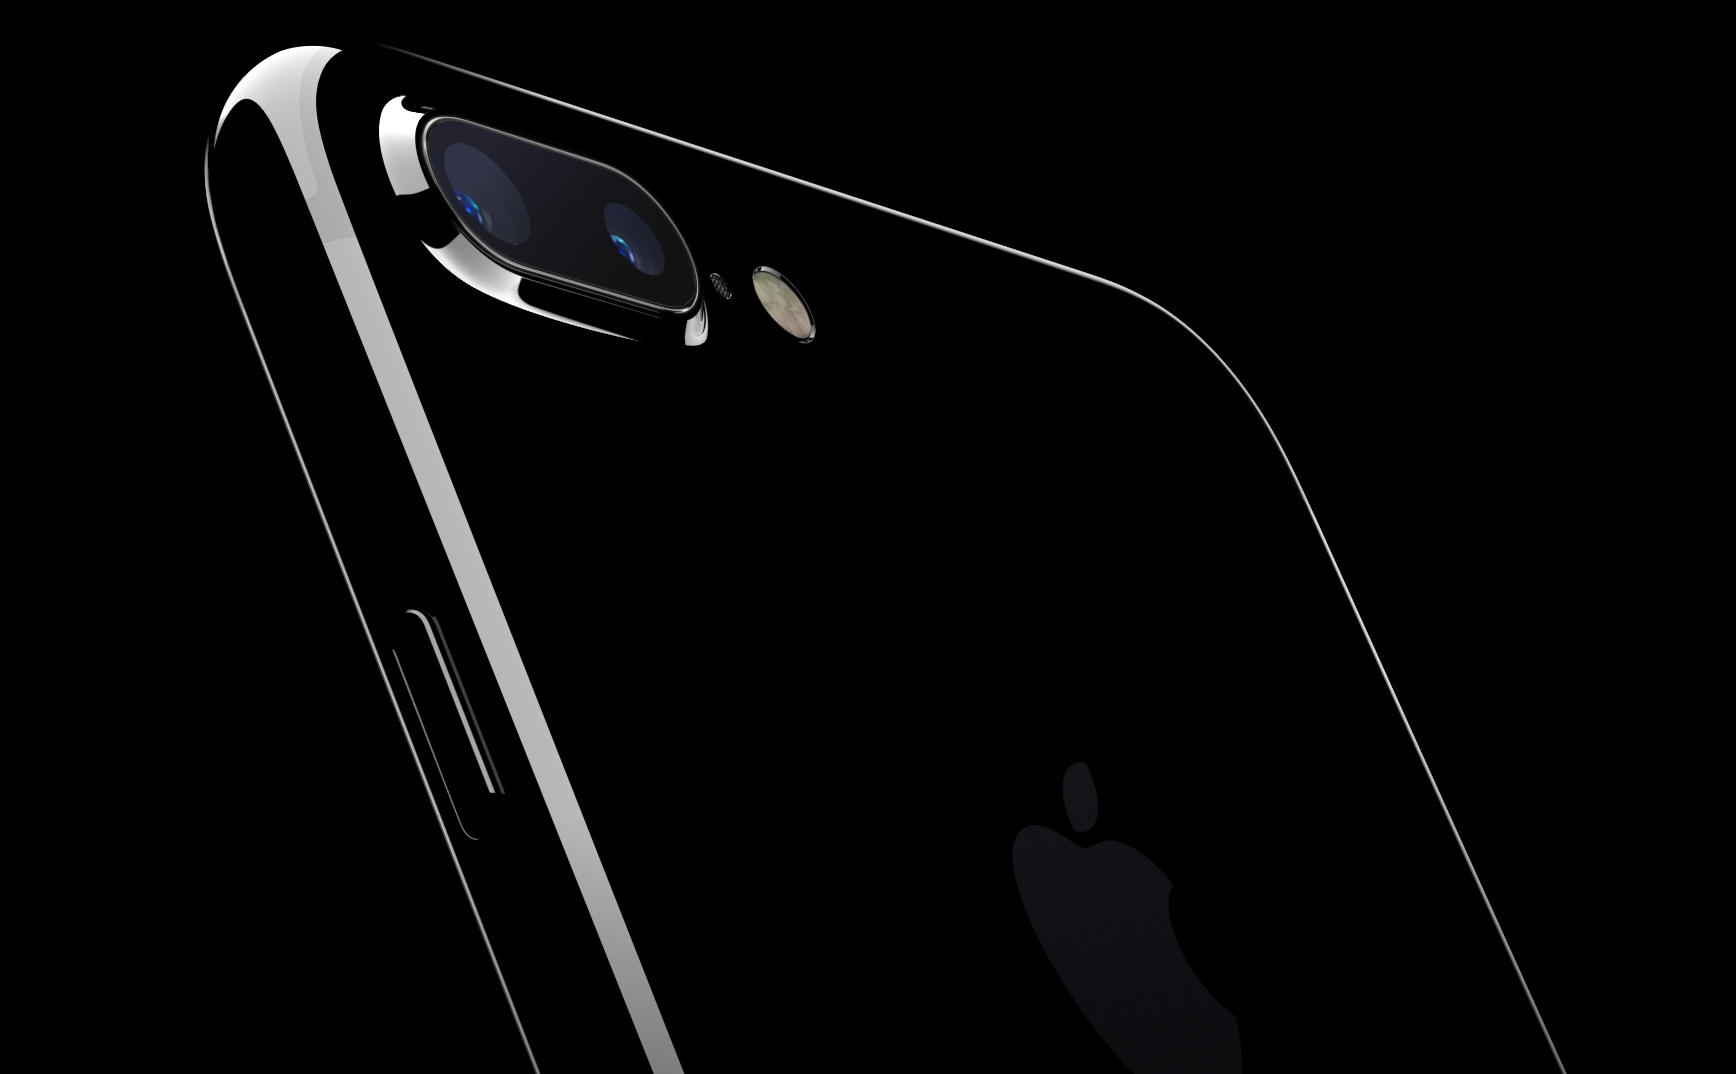 Apple iPhone 7 Plus iSight Jet Black